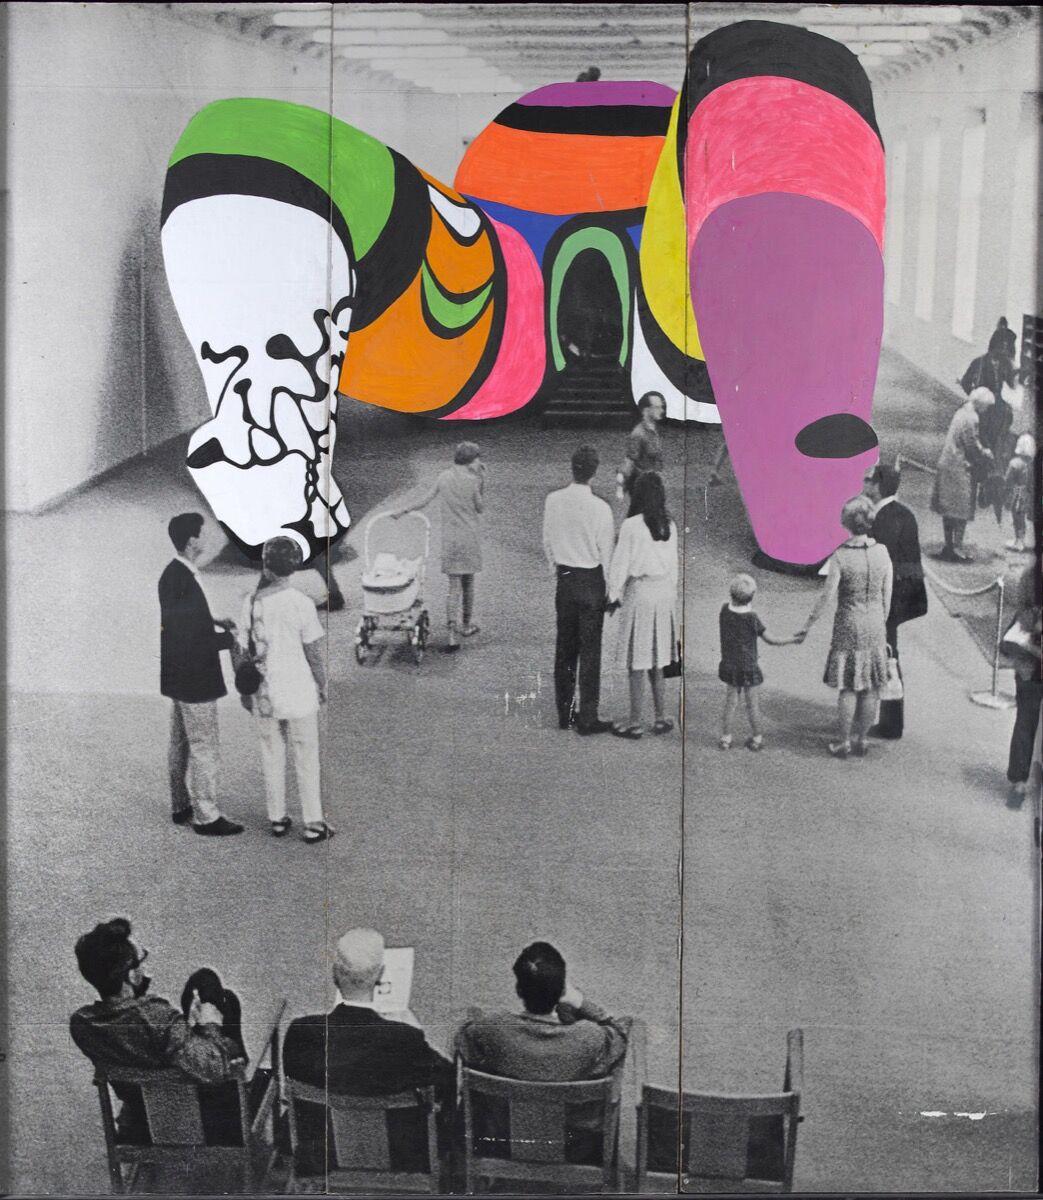 Niki de Saint Phalle. Photo de la Hon repeinte. 1979. Photo by Katrin Baumann. © 2019 Niki Charitable Art Foundation. Courtesy of the Museum of Modern Art.